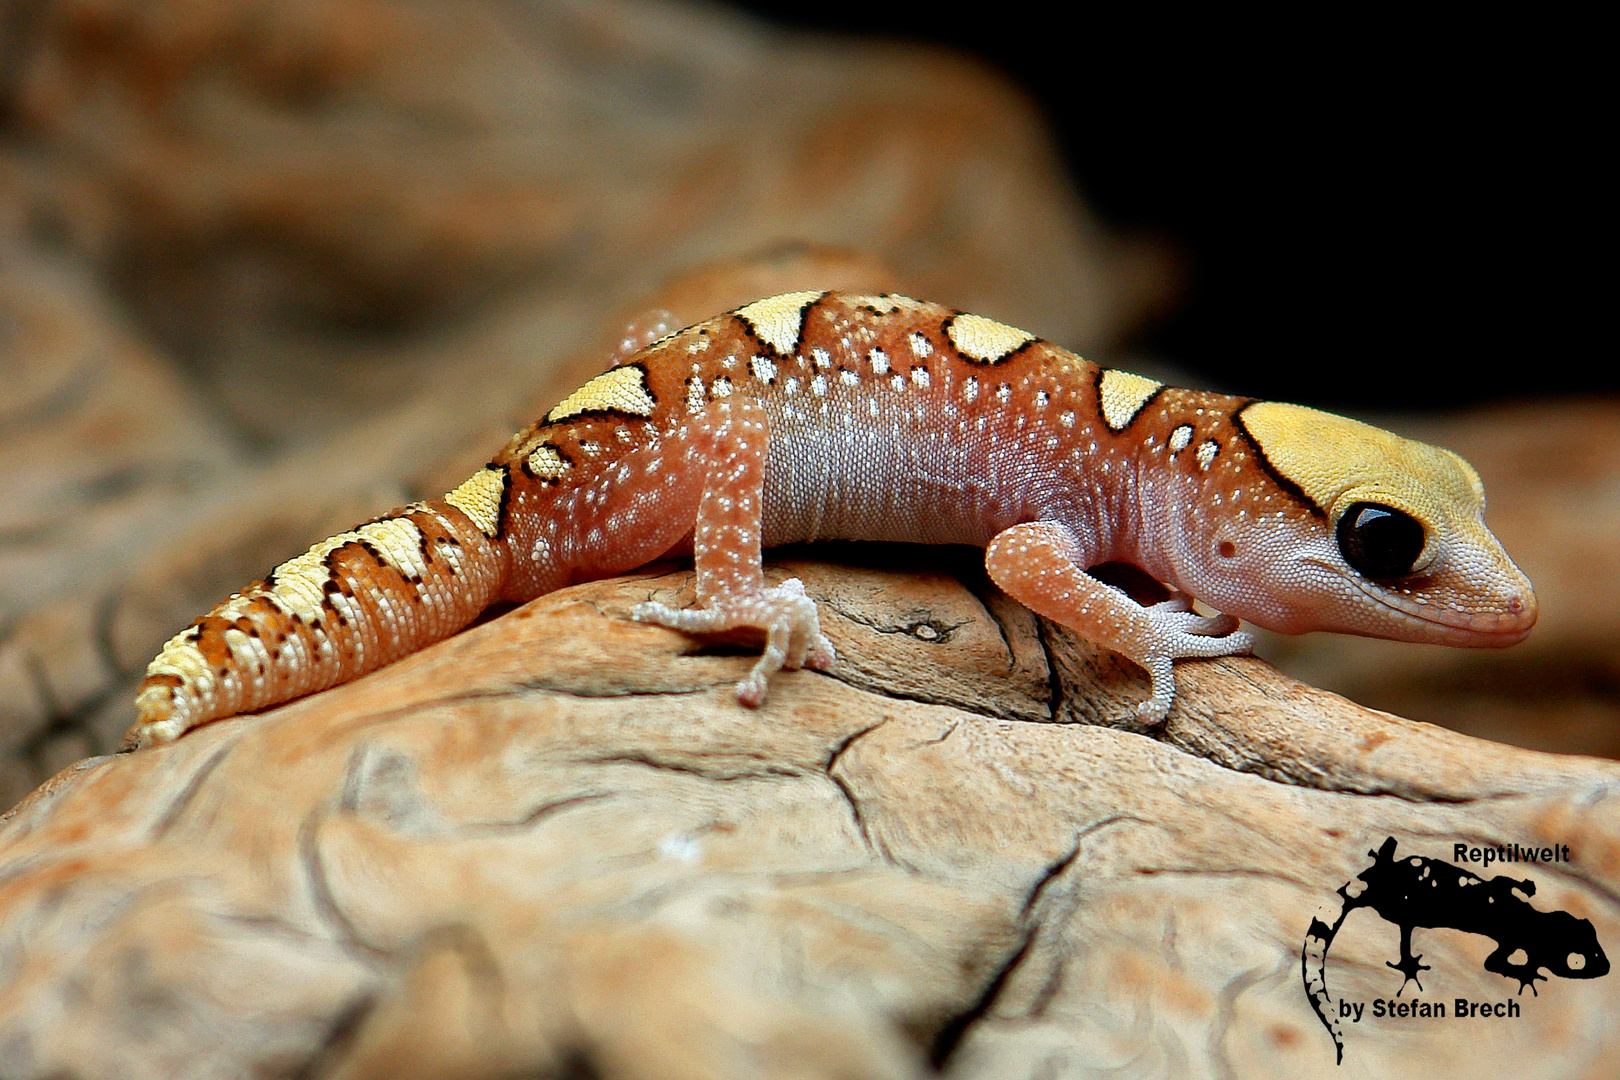 Diplodactylus galeatus